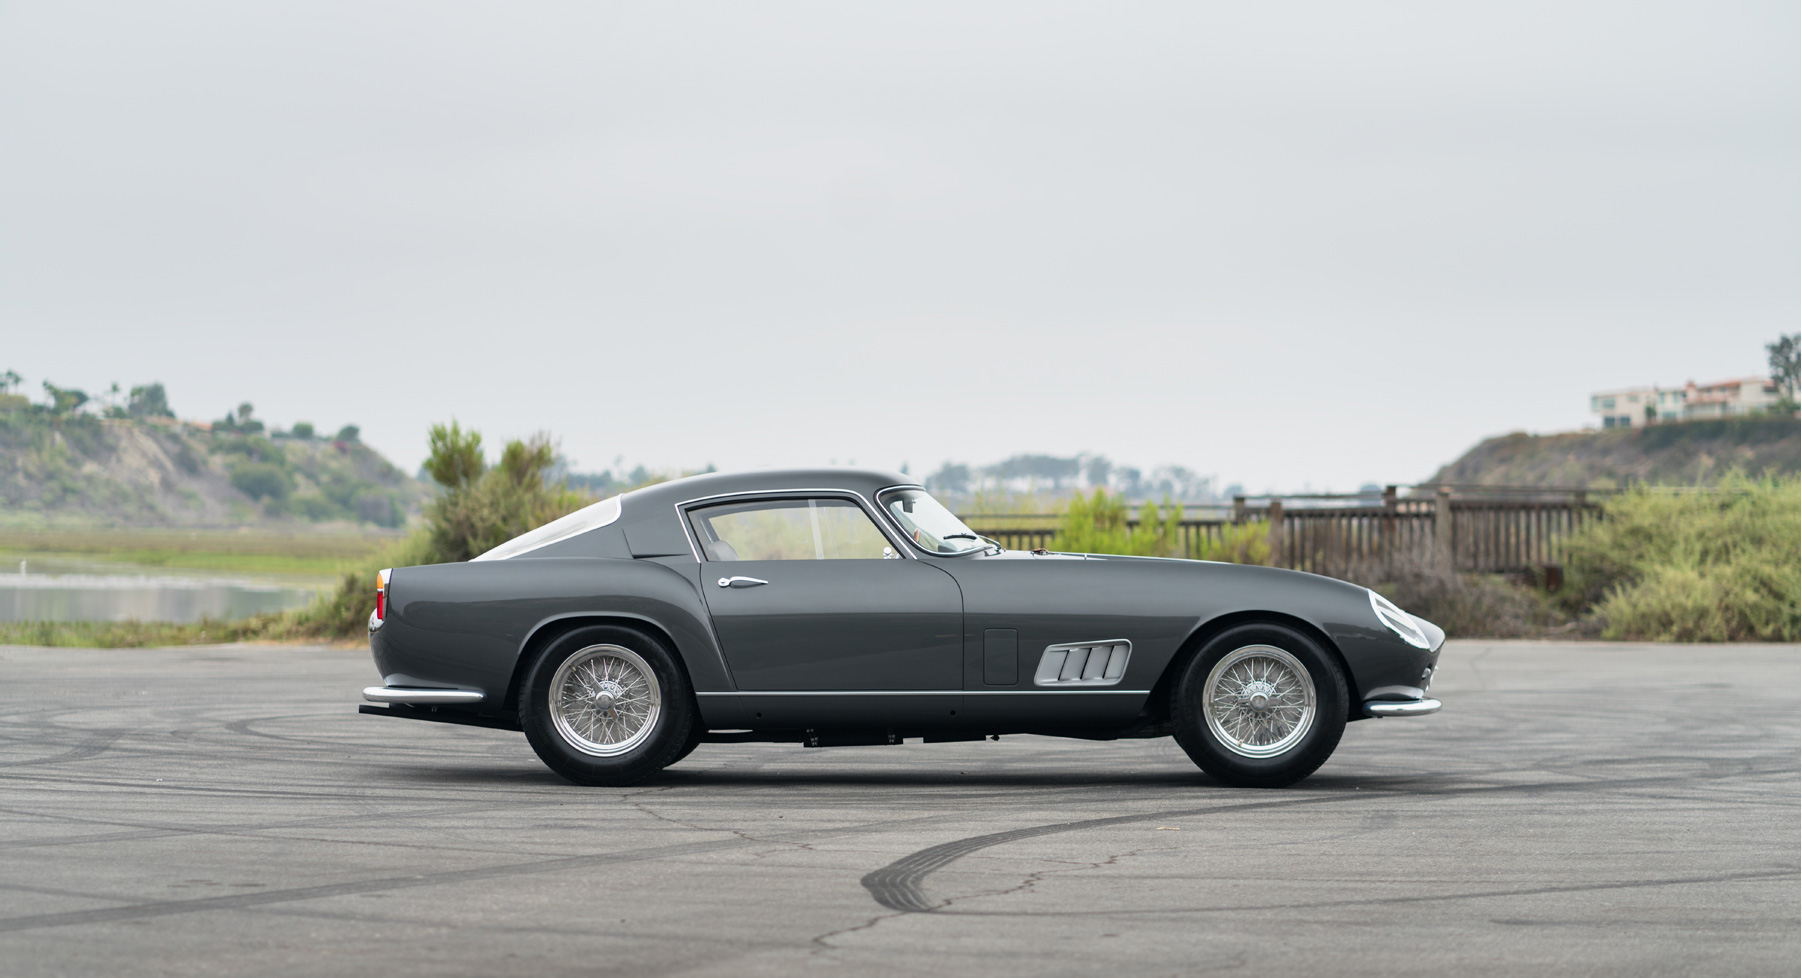 Classic Car Find Of The Week: 1959 Ferrari 250 GT Tour De France